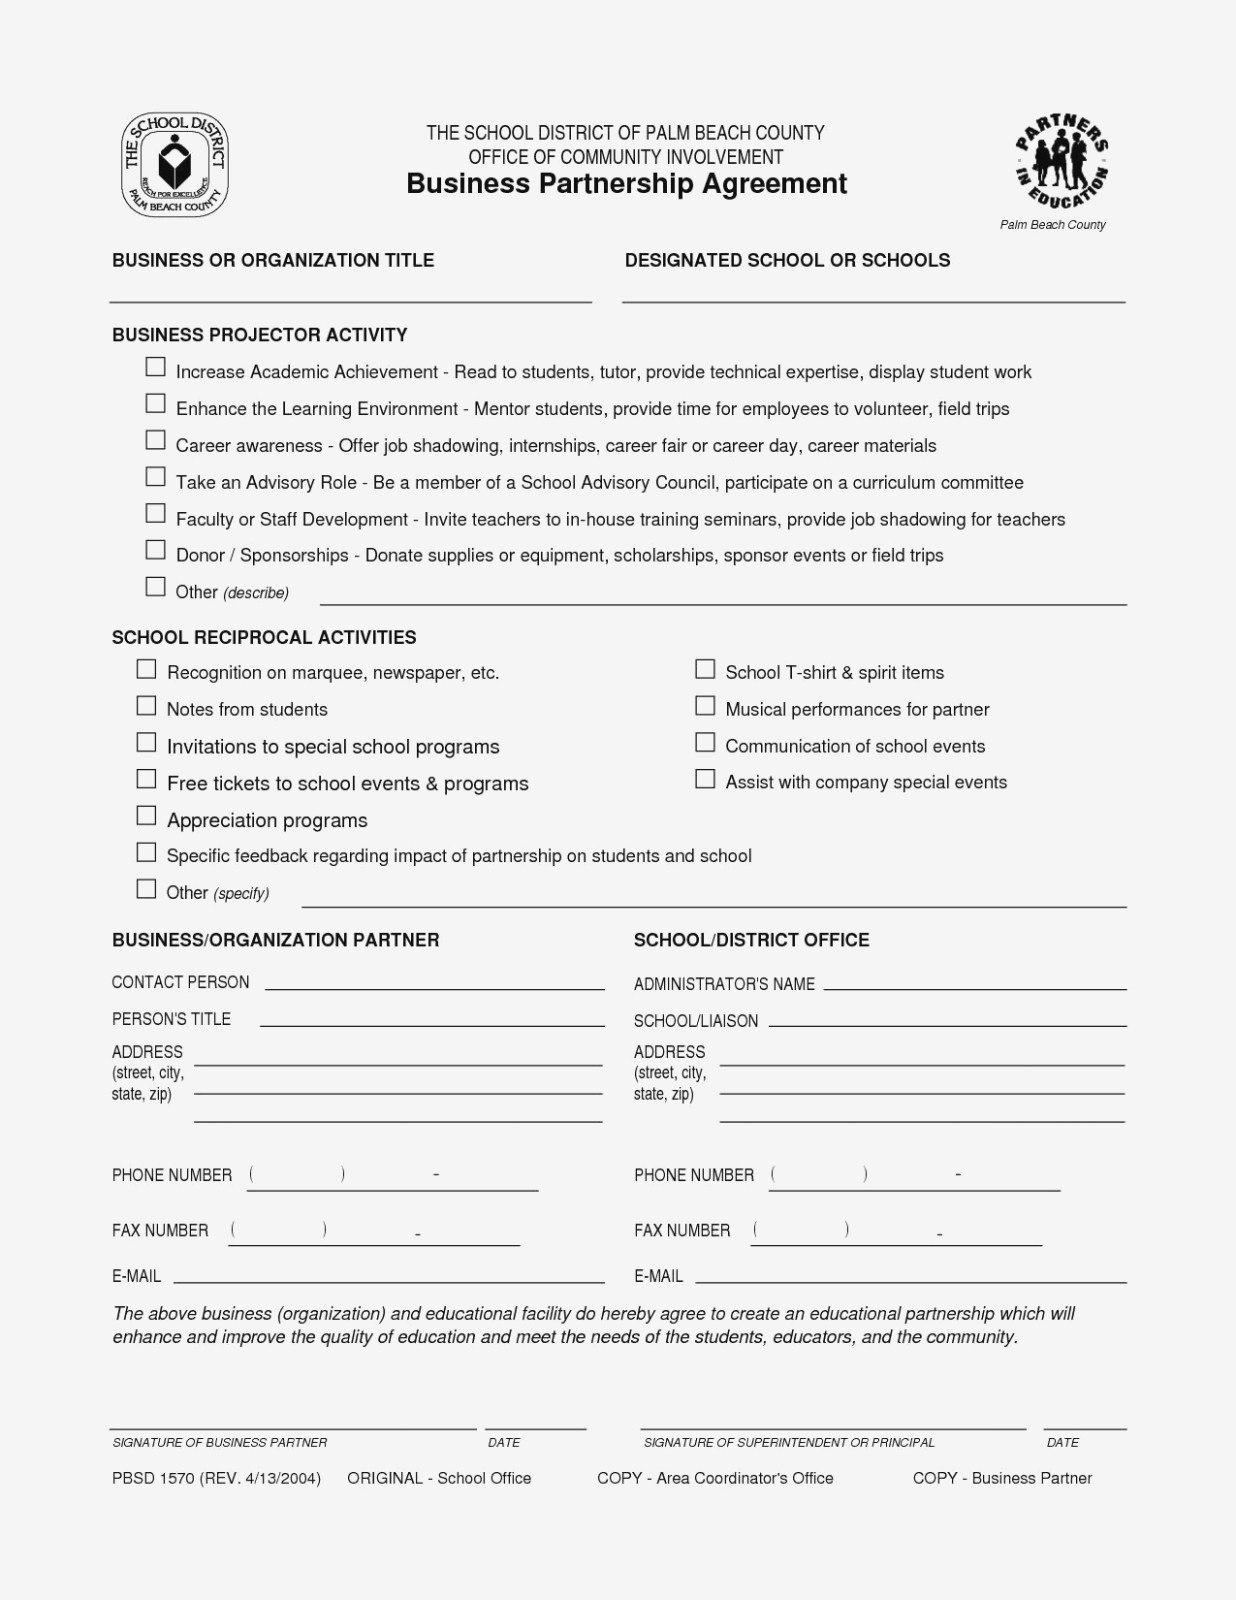 General Partnership Agreement Pdf – Kenicandlecomfortzone – Form Regarding Business Partnership Agreement Template Pdf